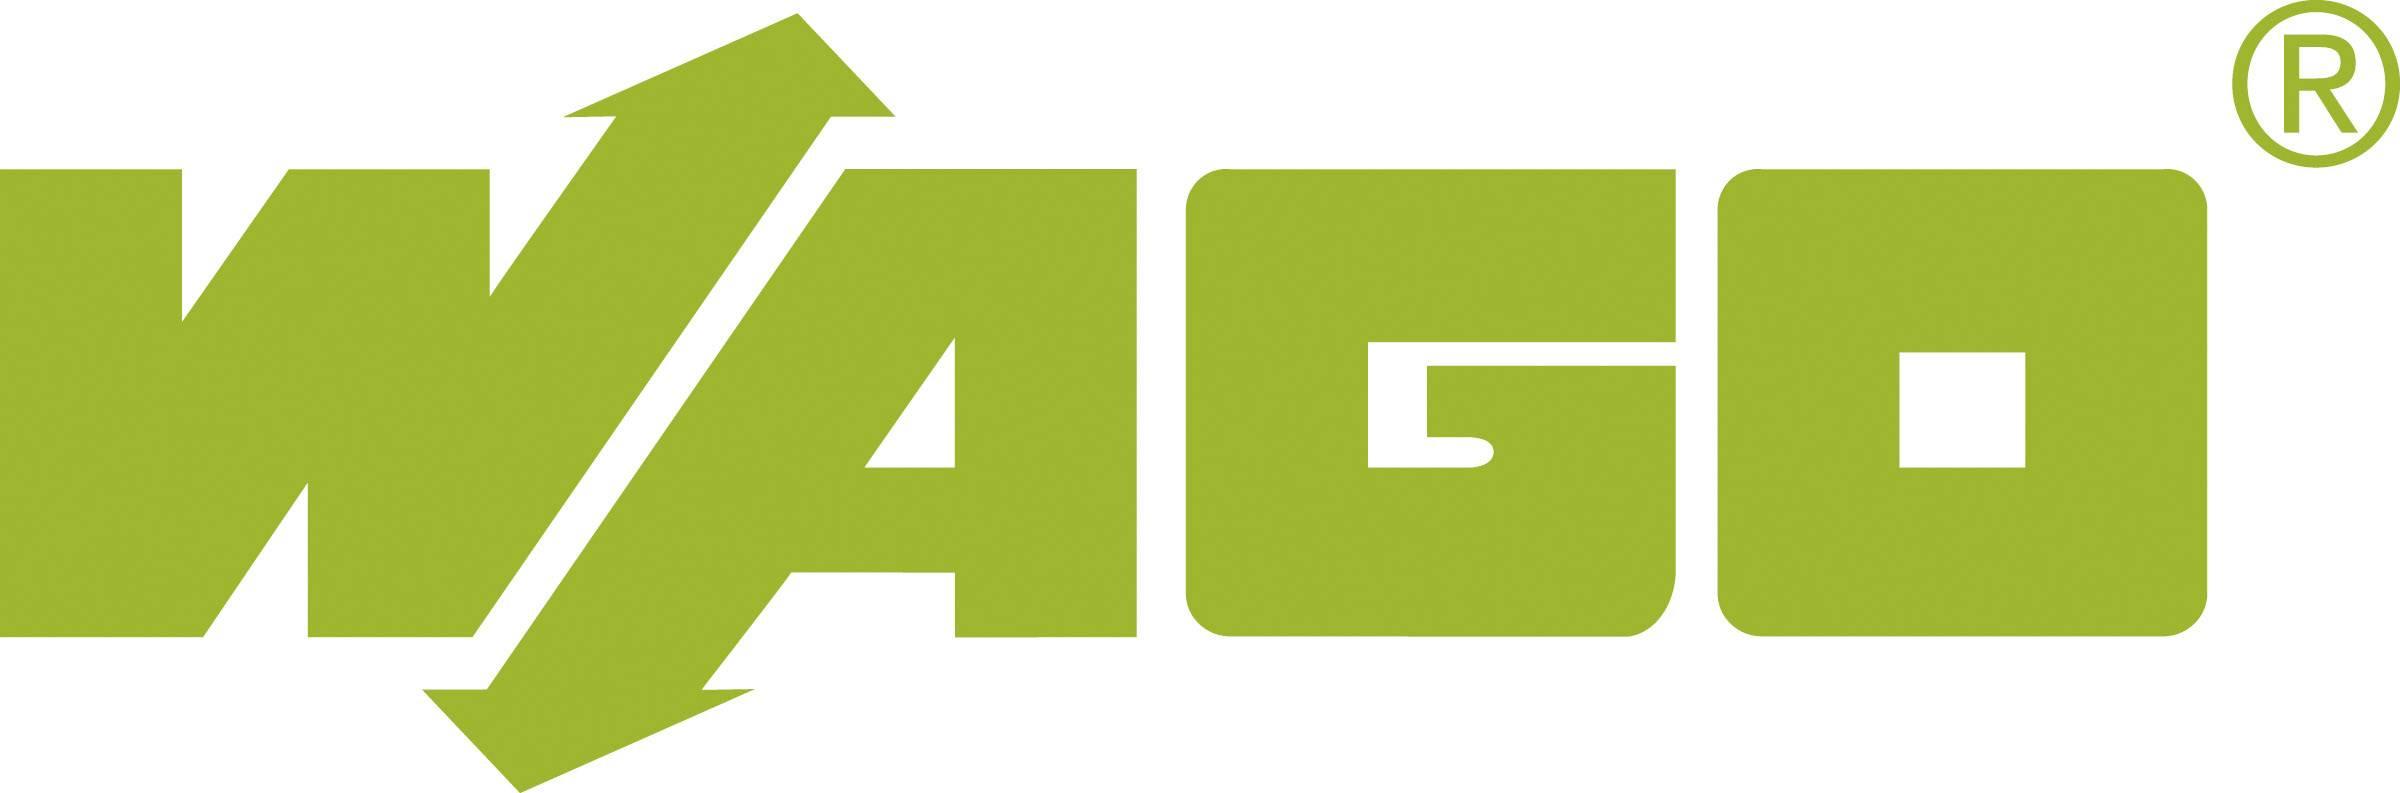 Wago (PLC)